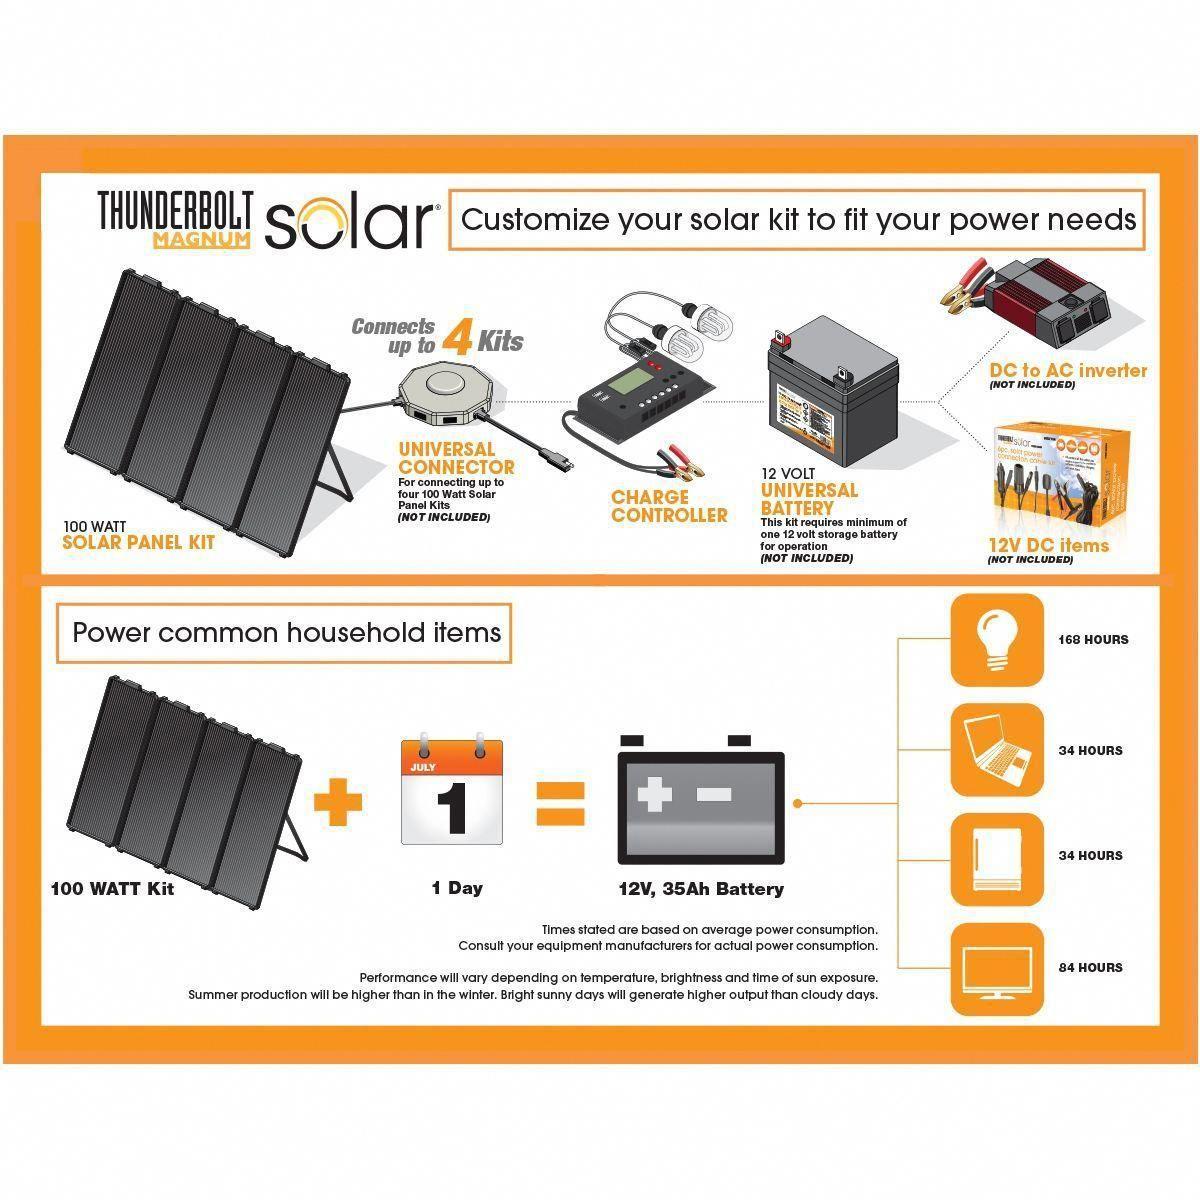 Battery Reconditioning Franchise South Africa Id 5763127537 Reconditionoldbatteries 100 Watt Solar Panel Solar Energy Kits Solar Panel Kits